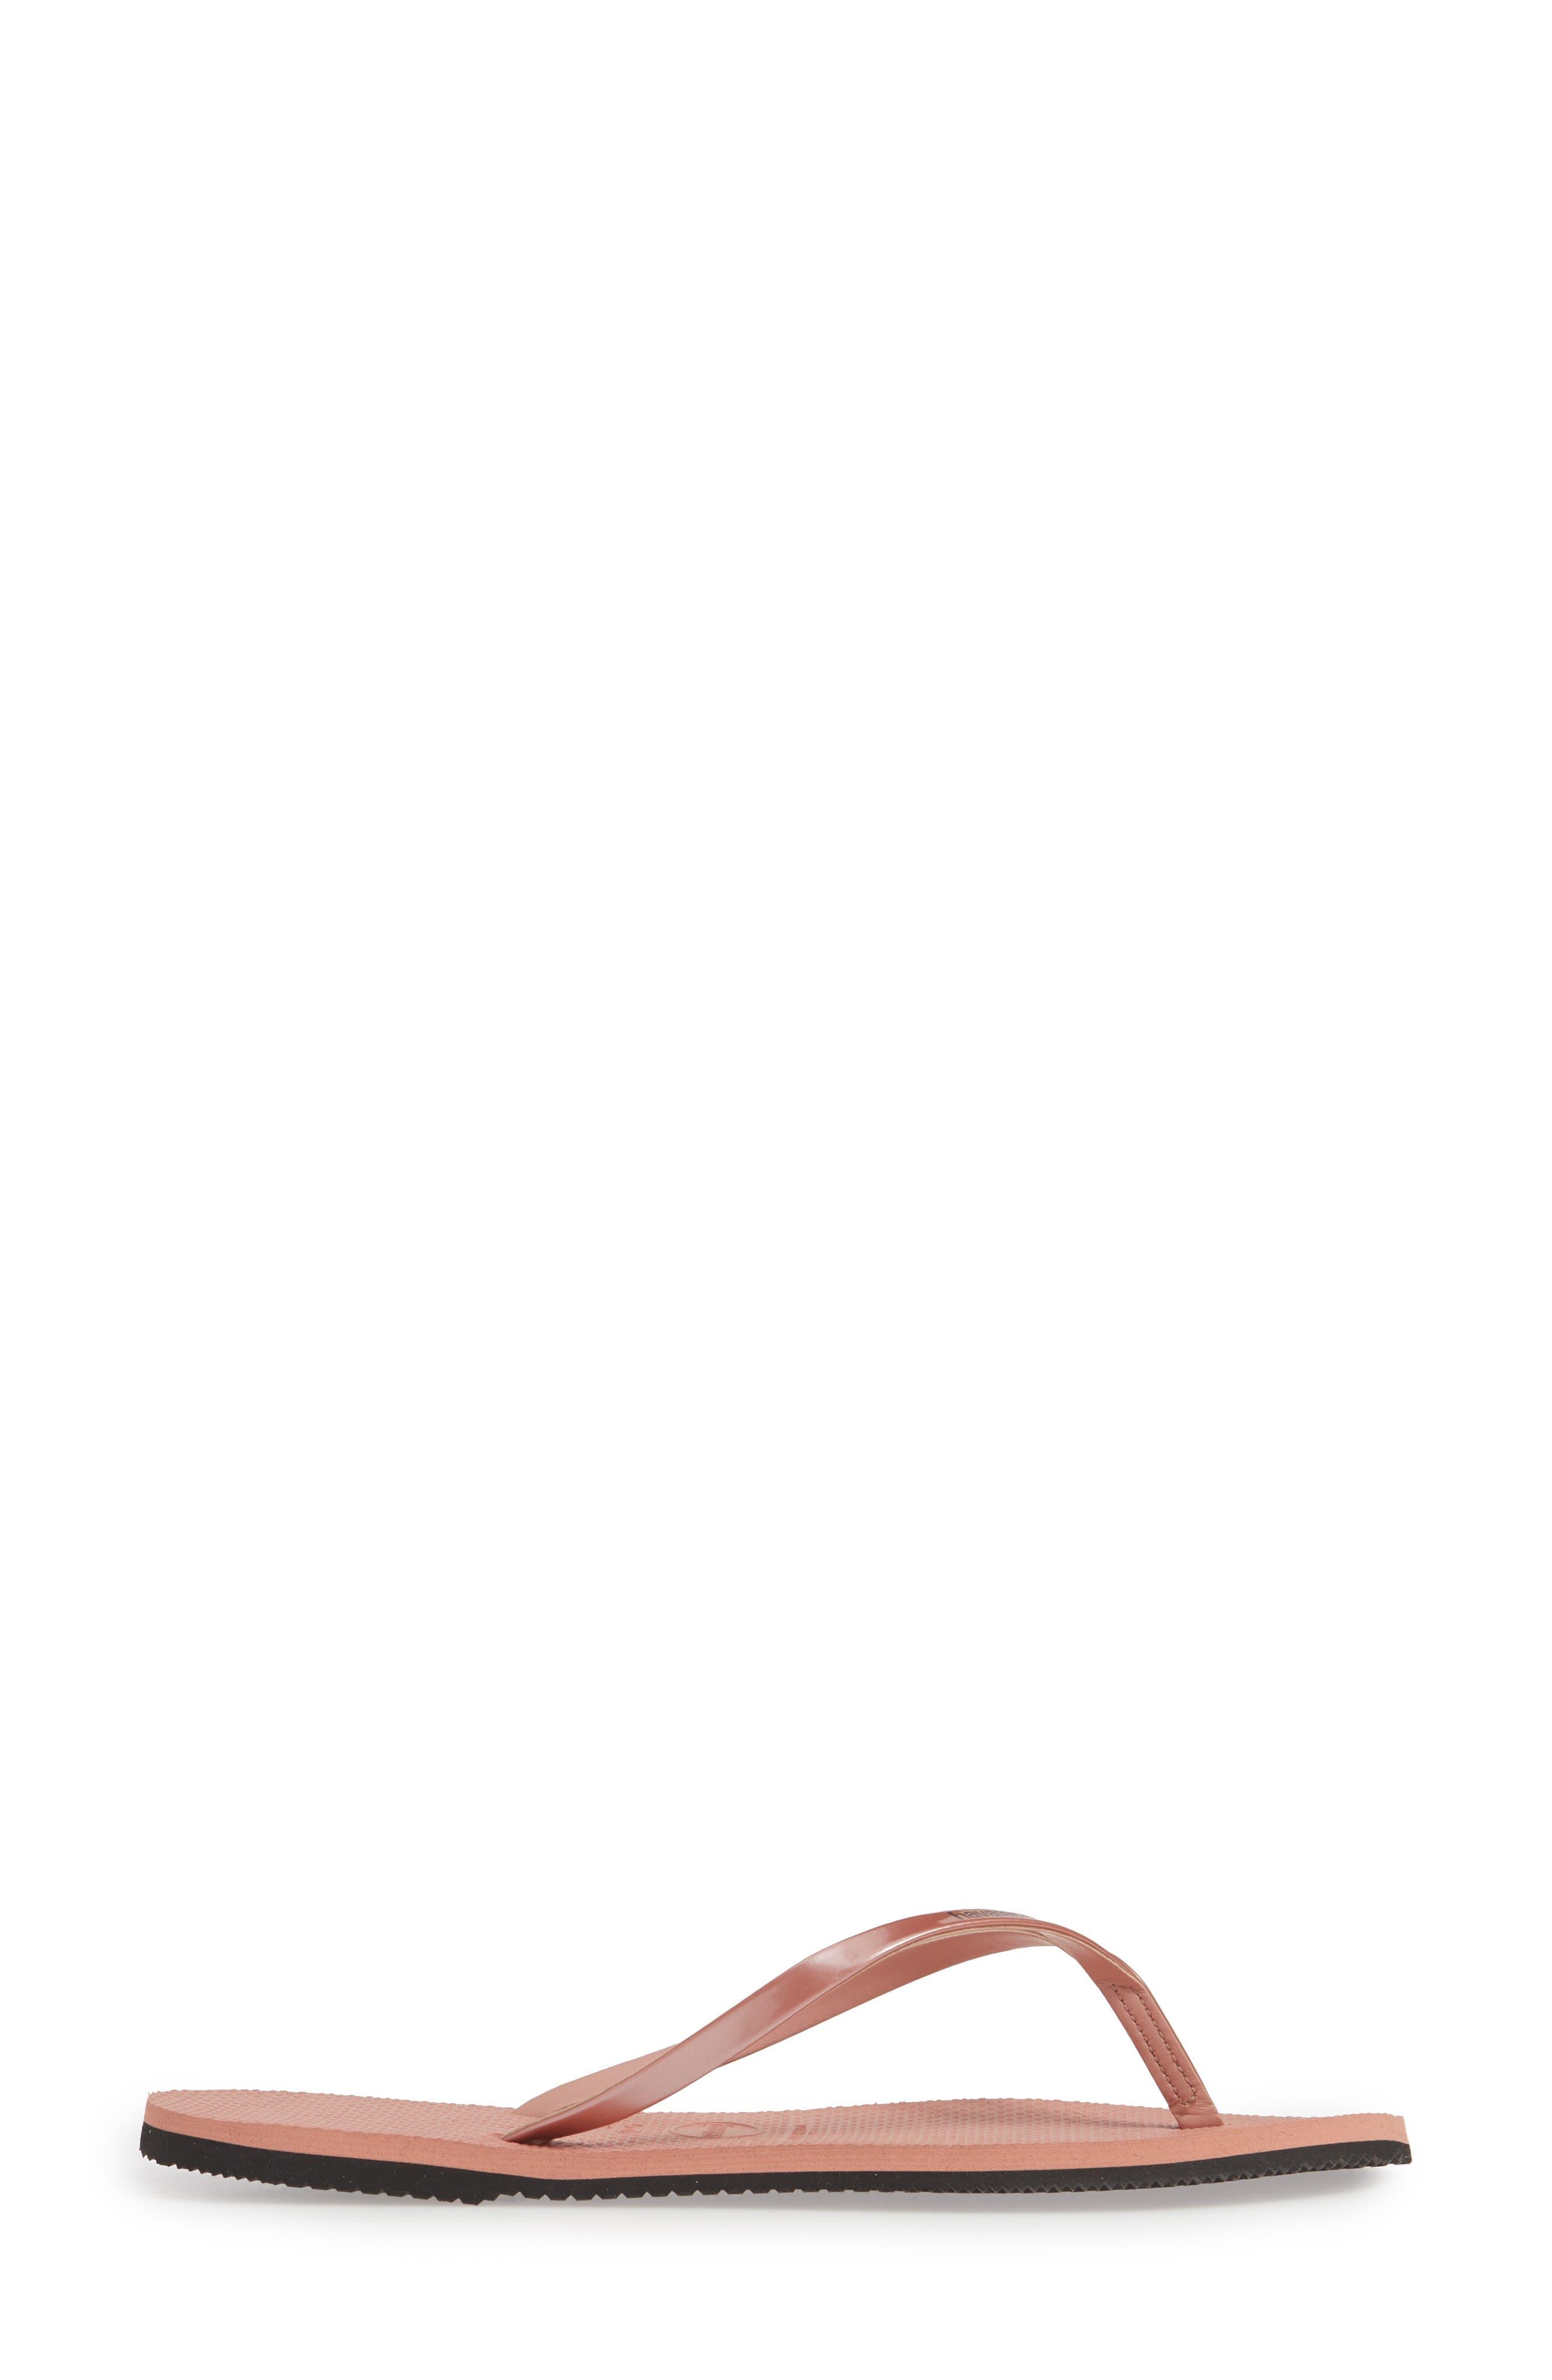 HAVAIANAS, 'You' Flip Flop, Alternate thumbnail 4, color, ROSE NUDE